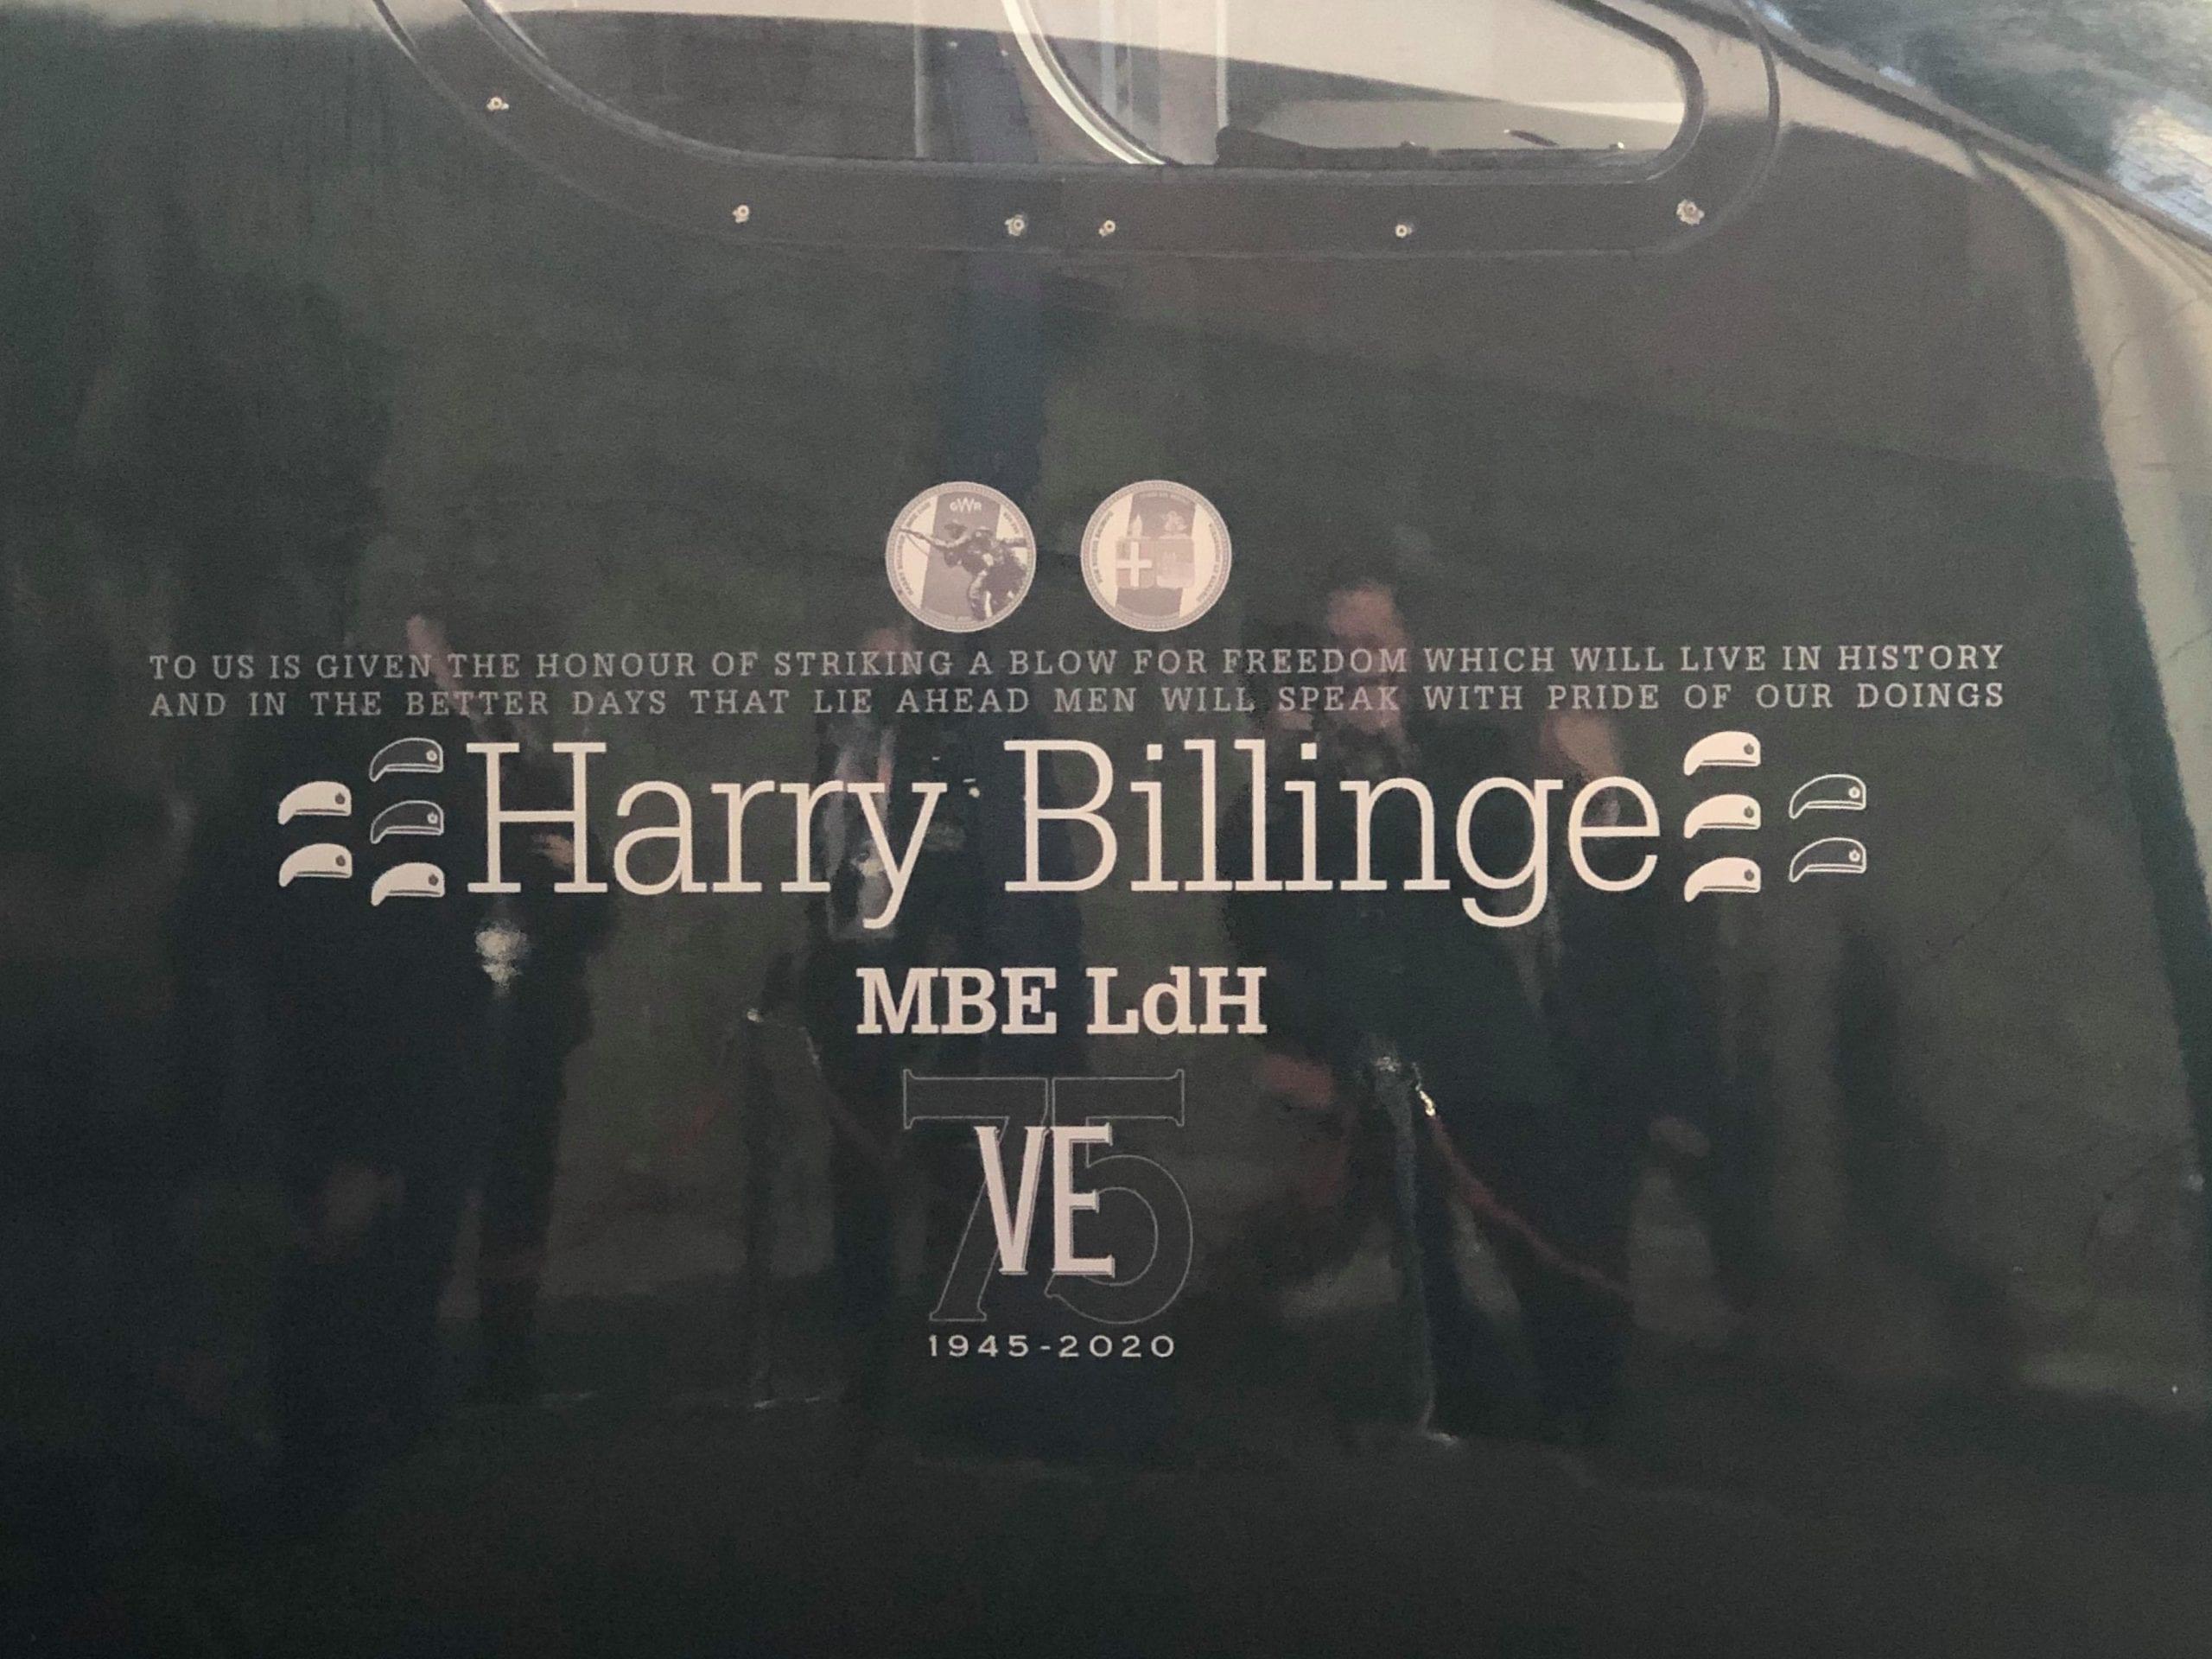 harry billinge name on train